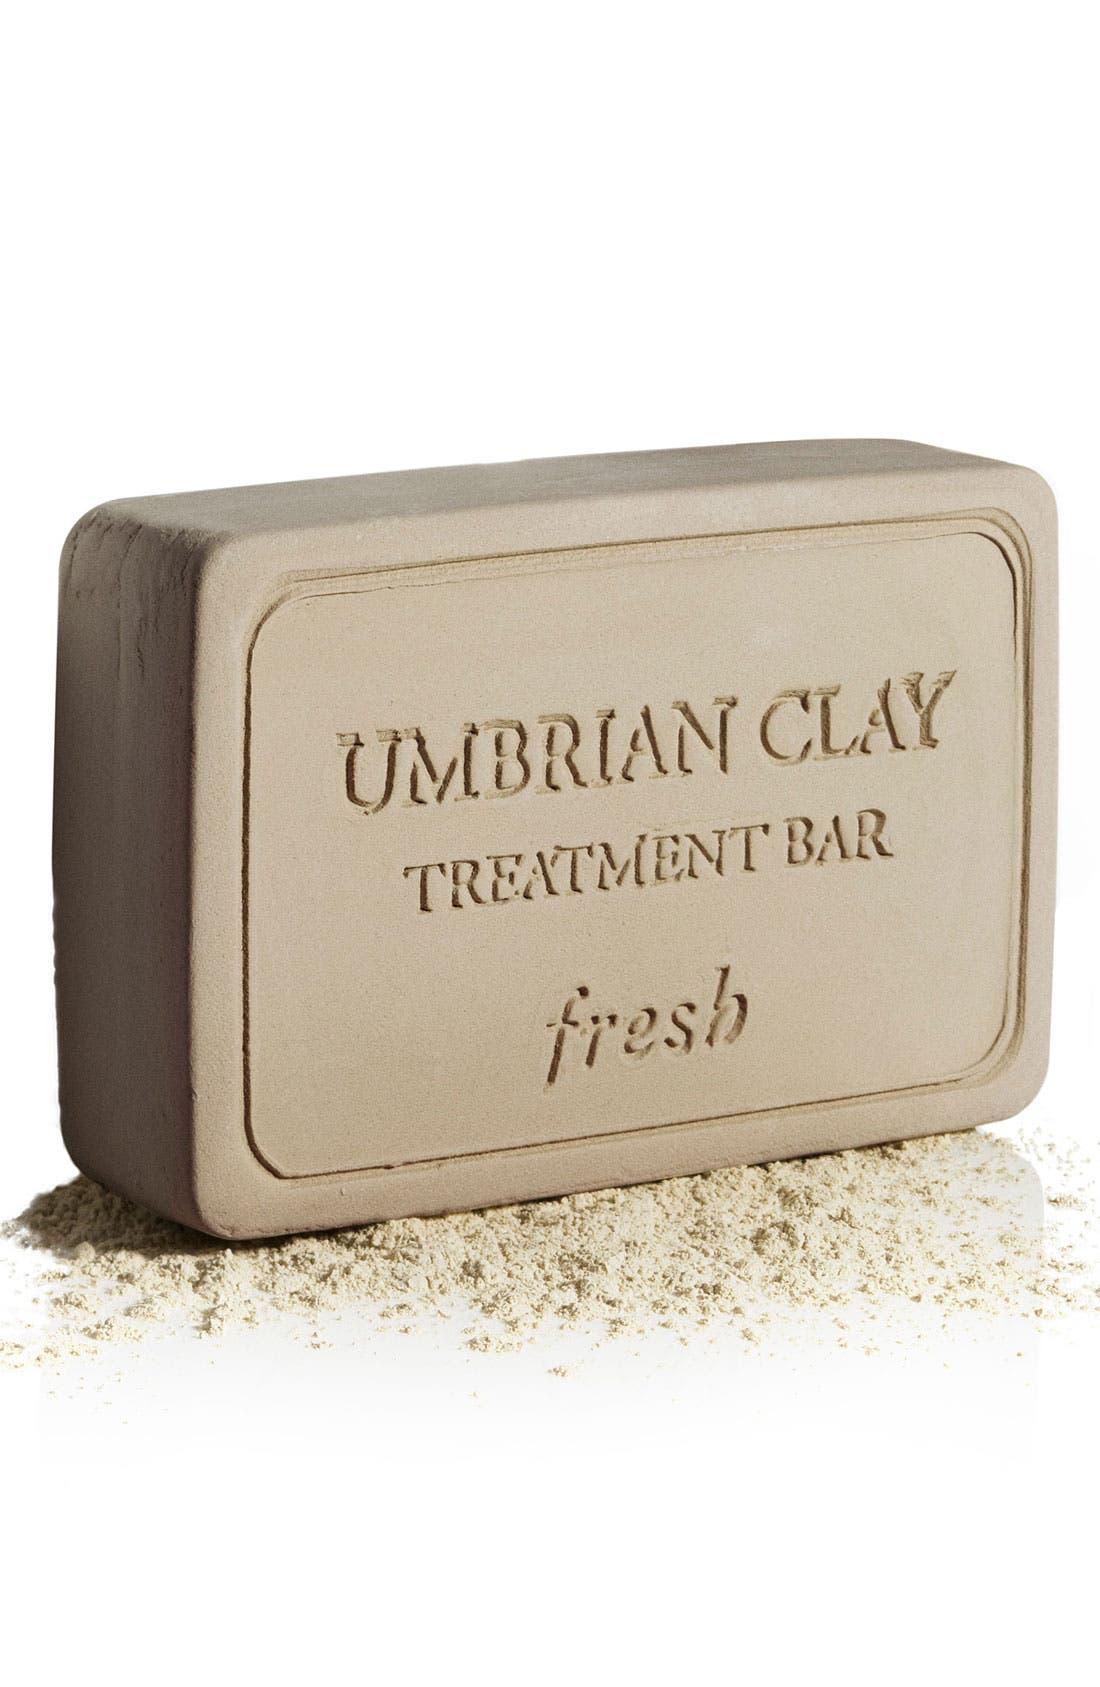 Fresh Umbrian Clay Treatment Bar